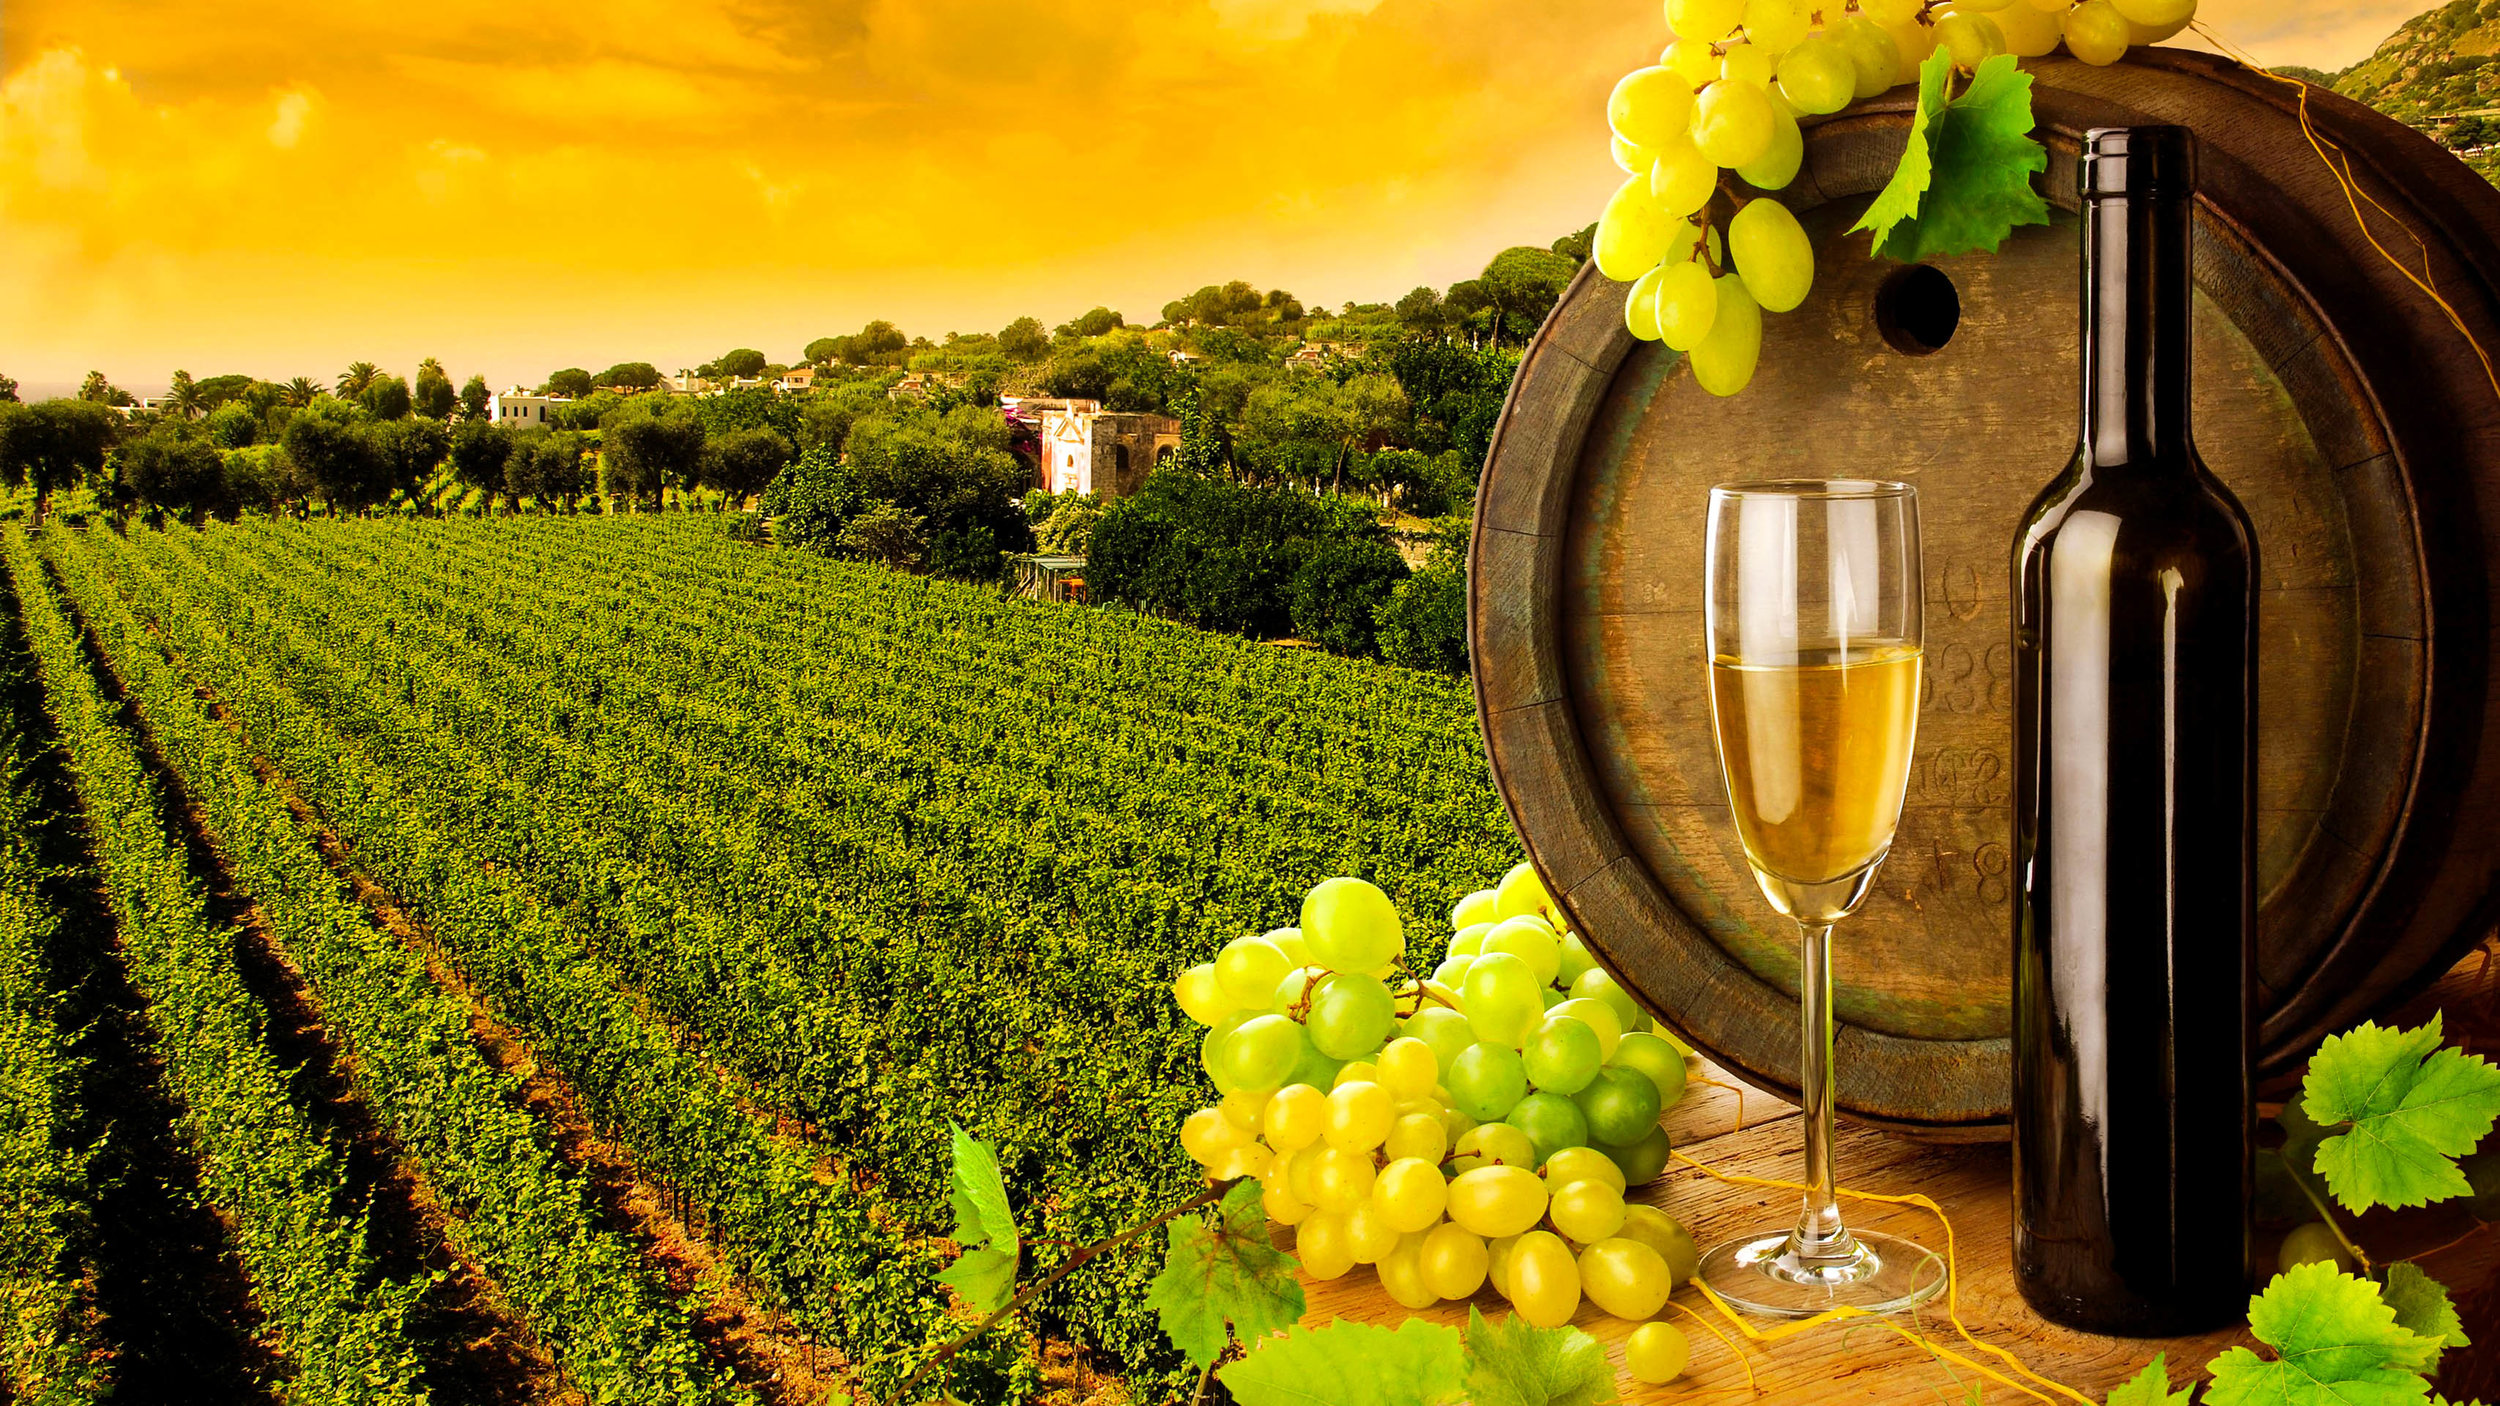 vineyards-c169-alr-1.jpg